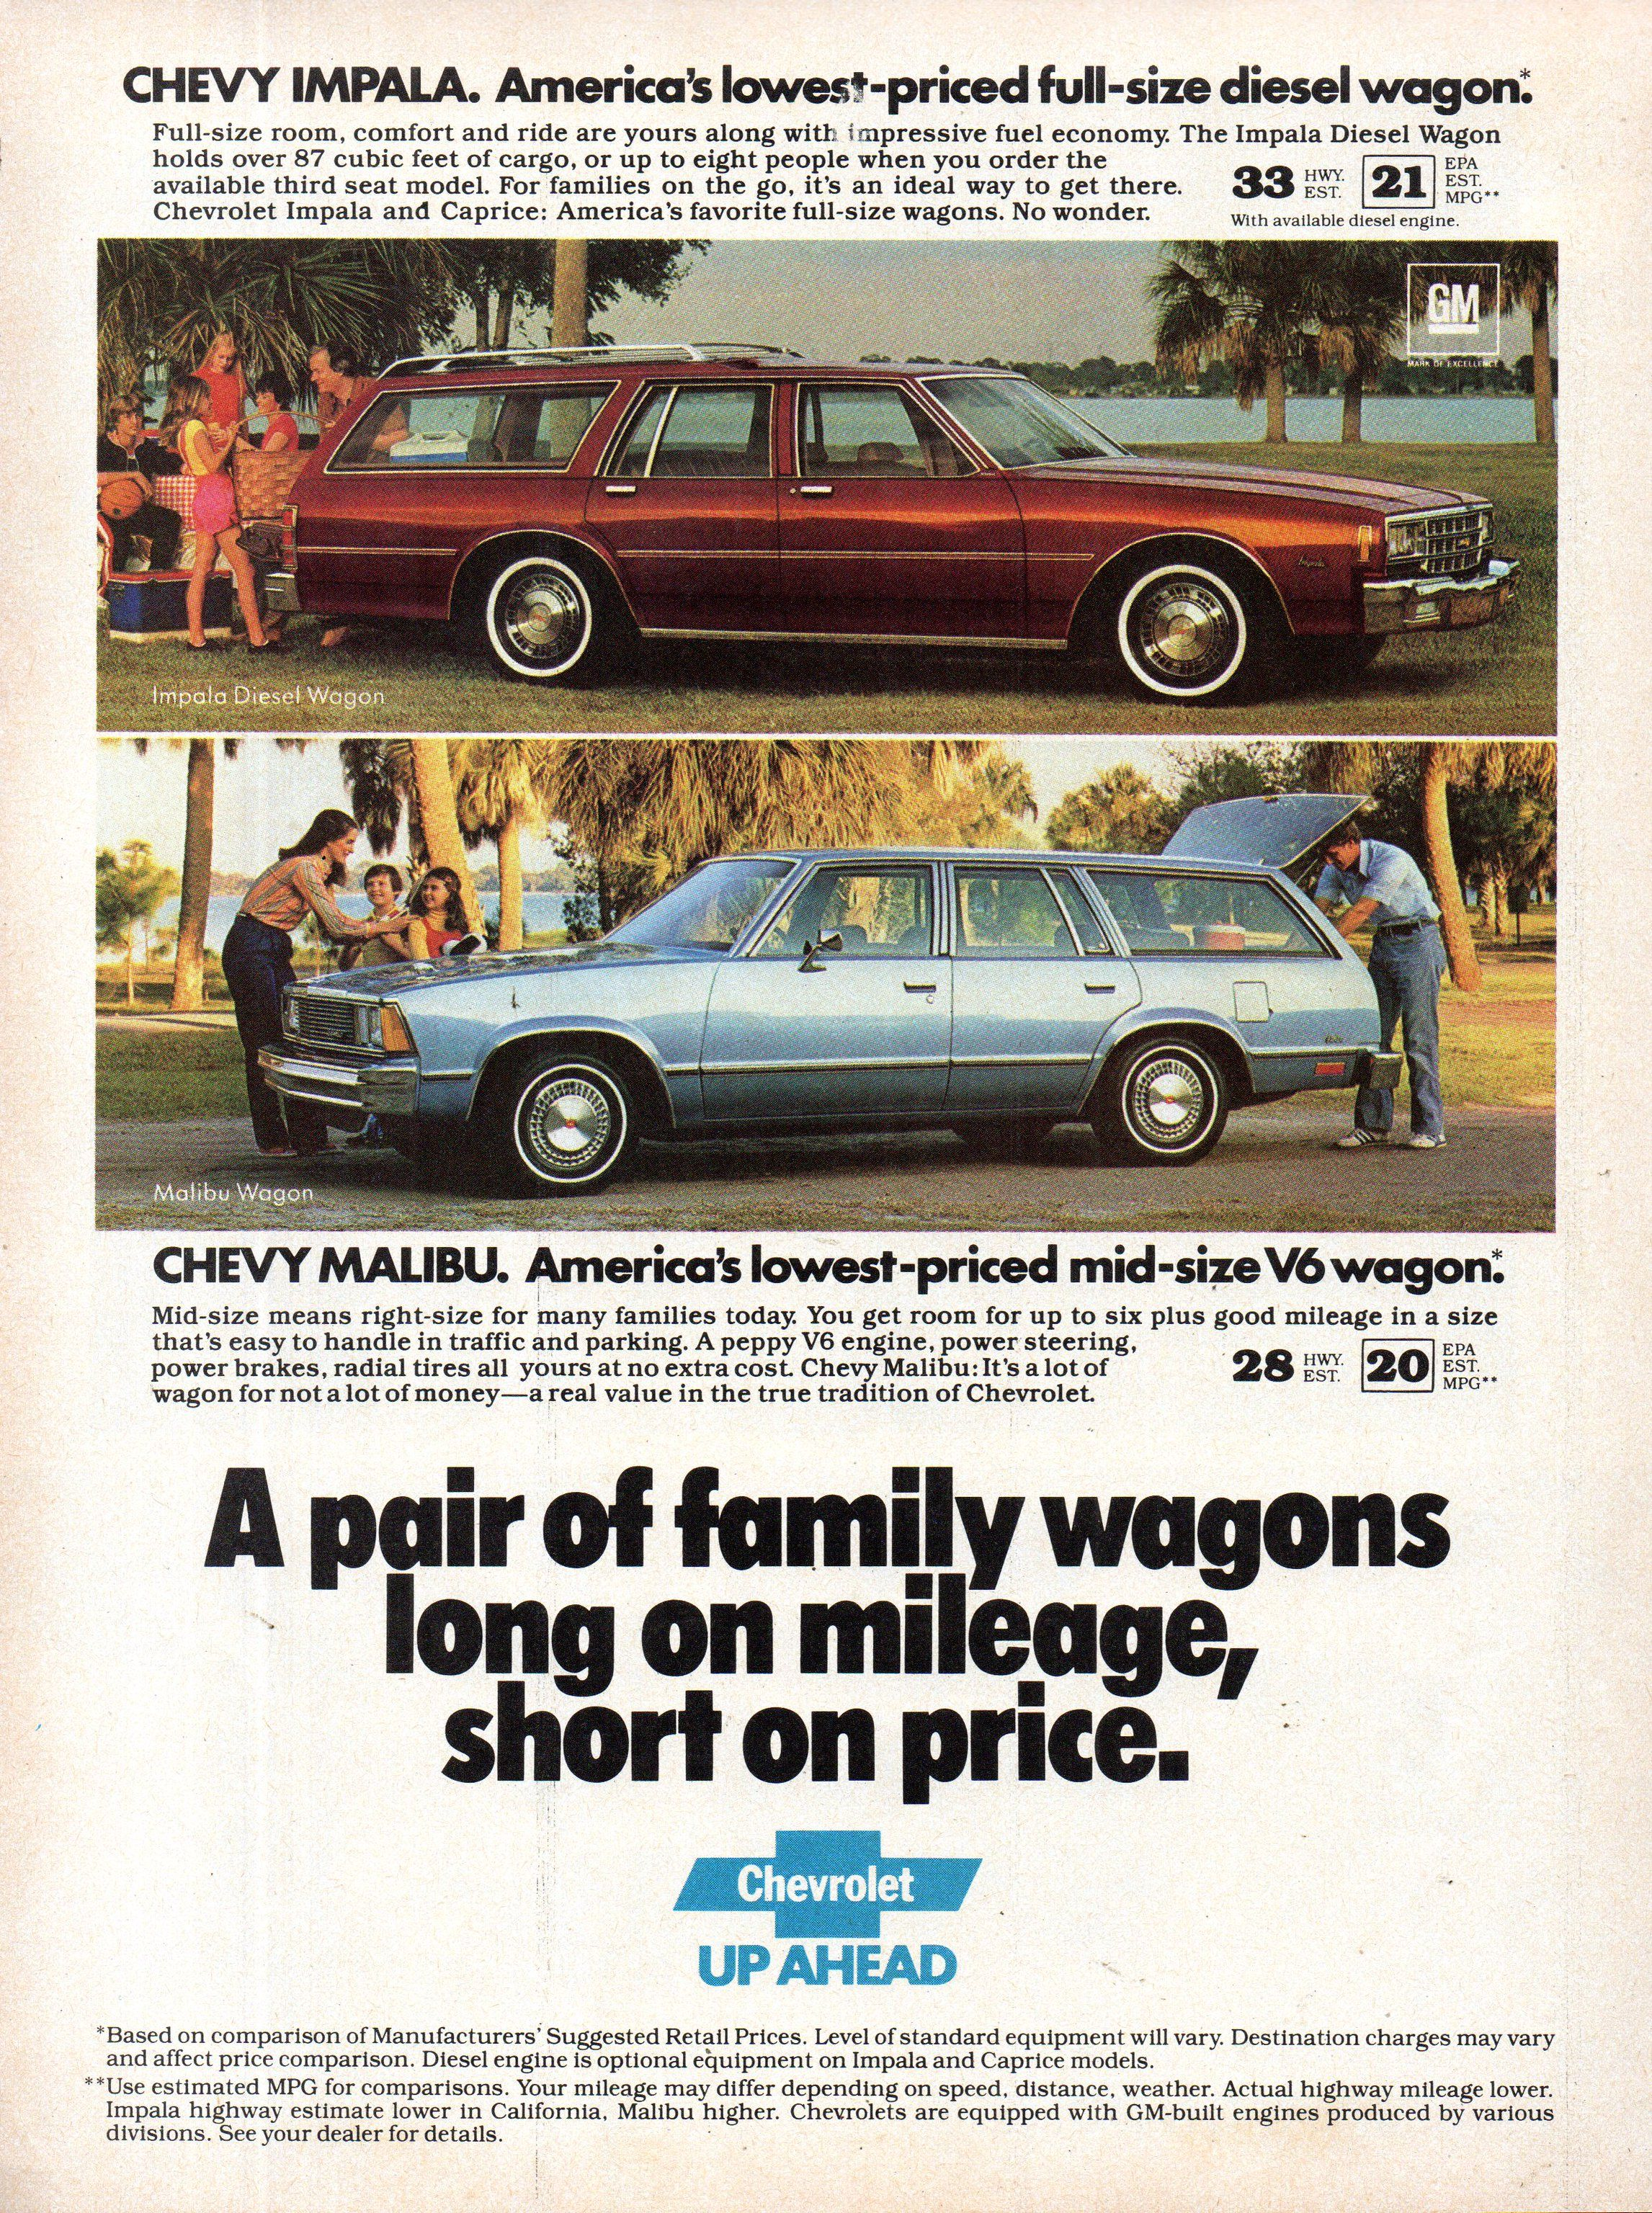 1981 Chevrolet Impala Diesel Wagon Chevy Malibu V6 Wagon Usa Original Magazine Advertisement In 2020 Chevy Malibu Impala Chevrolet Impala